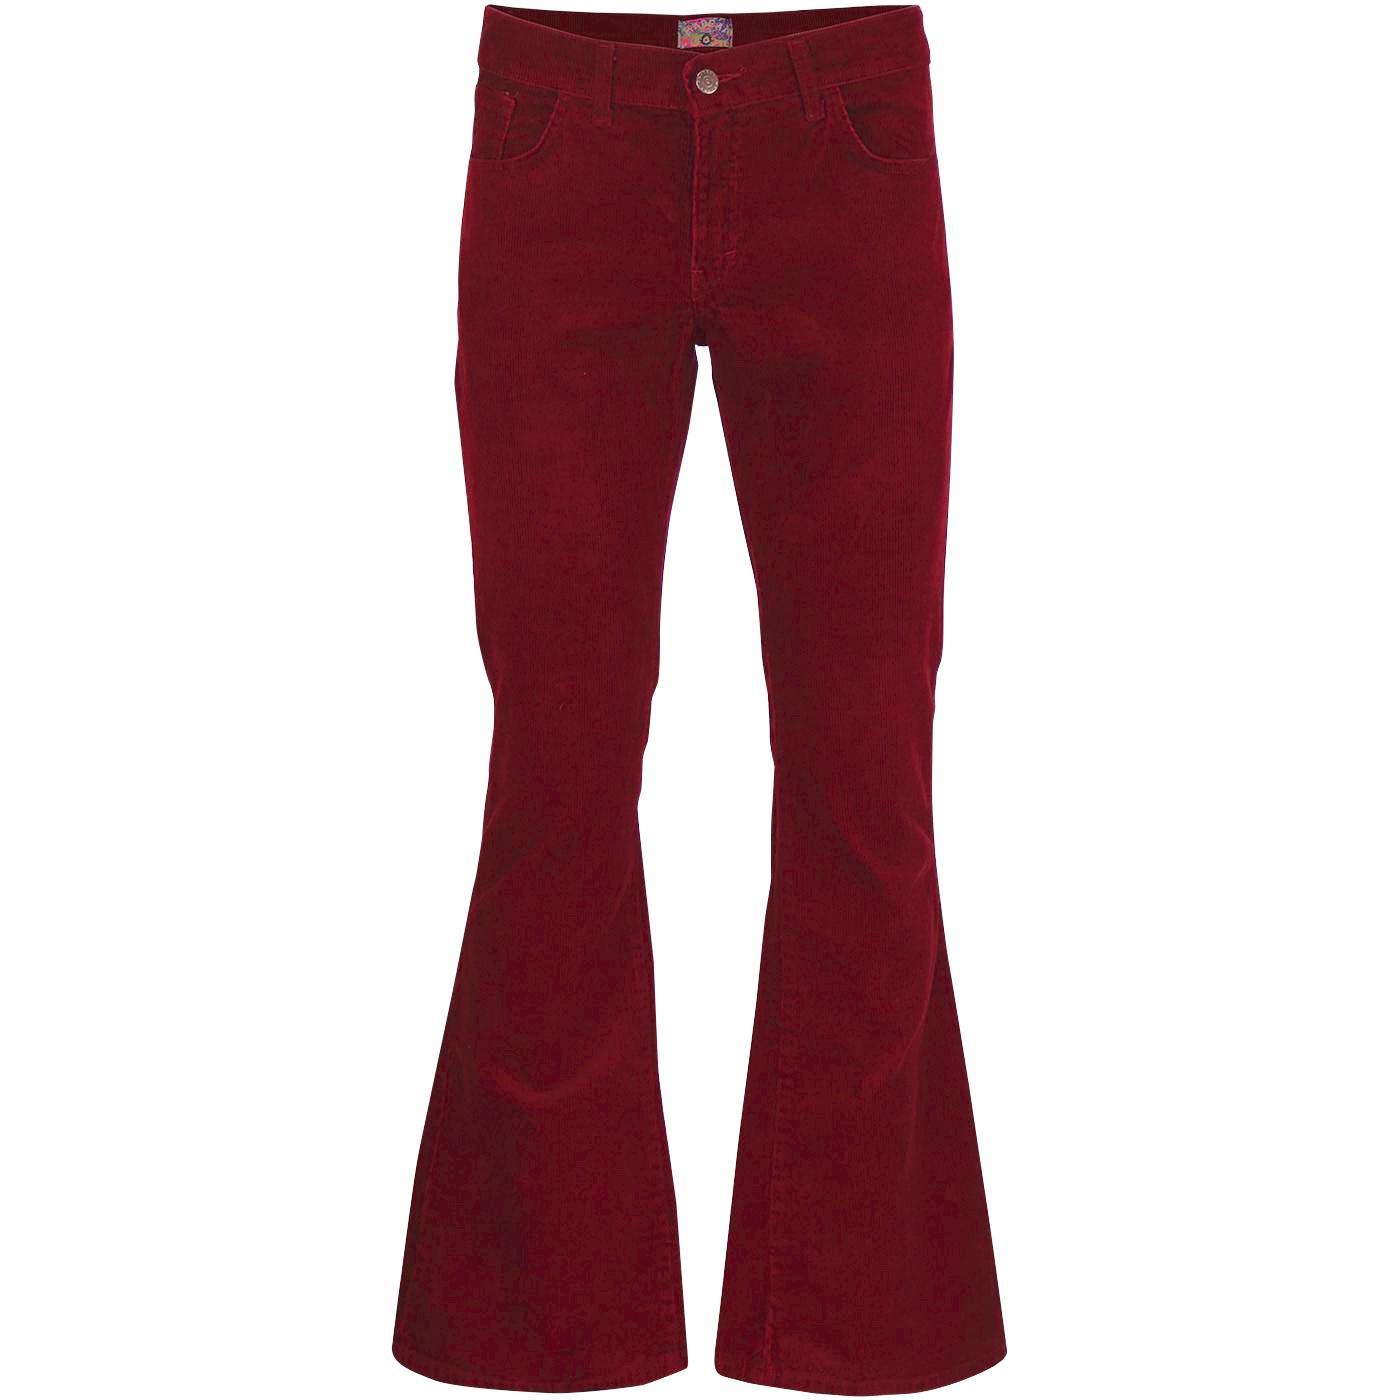 a37f3f9b Killer Men's Retro 1970s Needle Cord Flared Trousers in Tawny Port